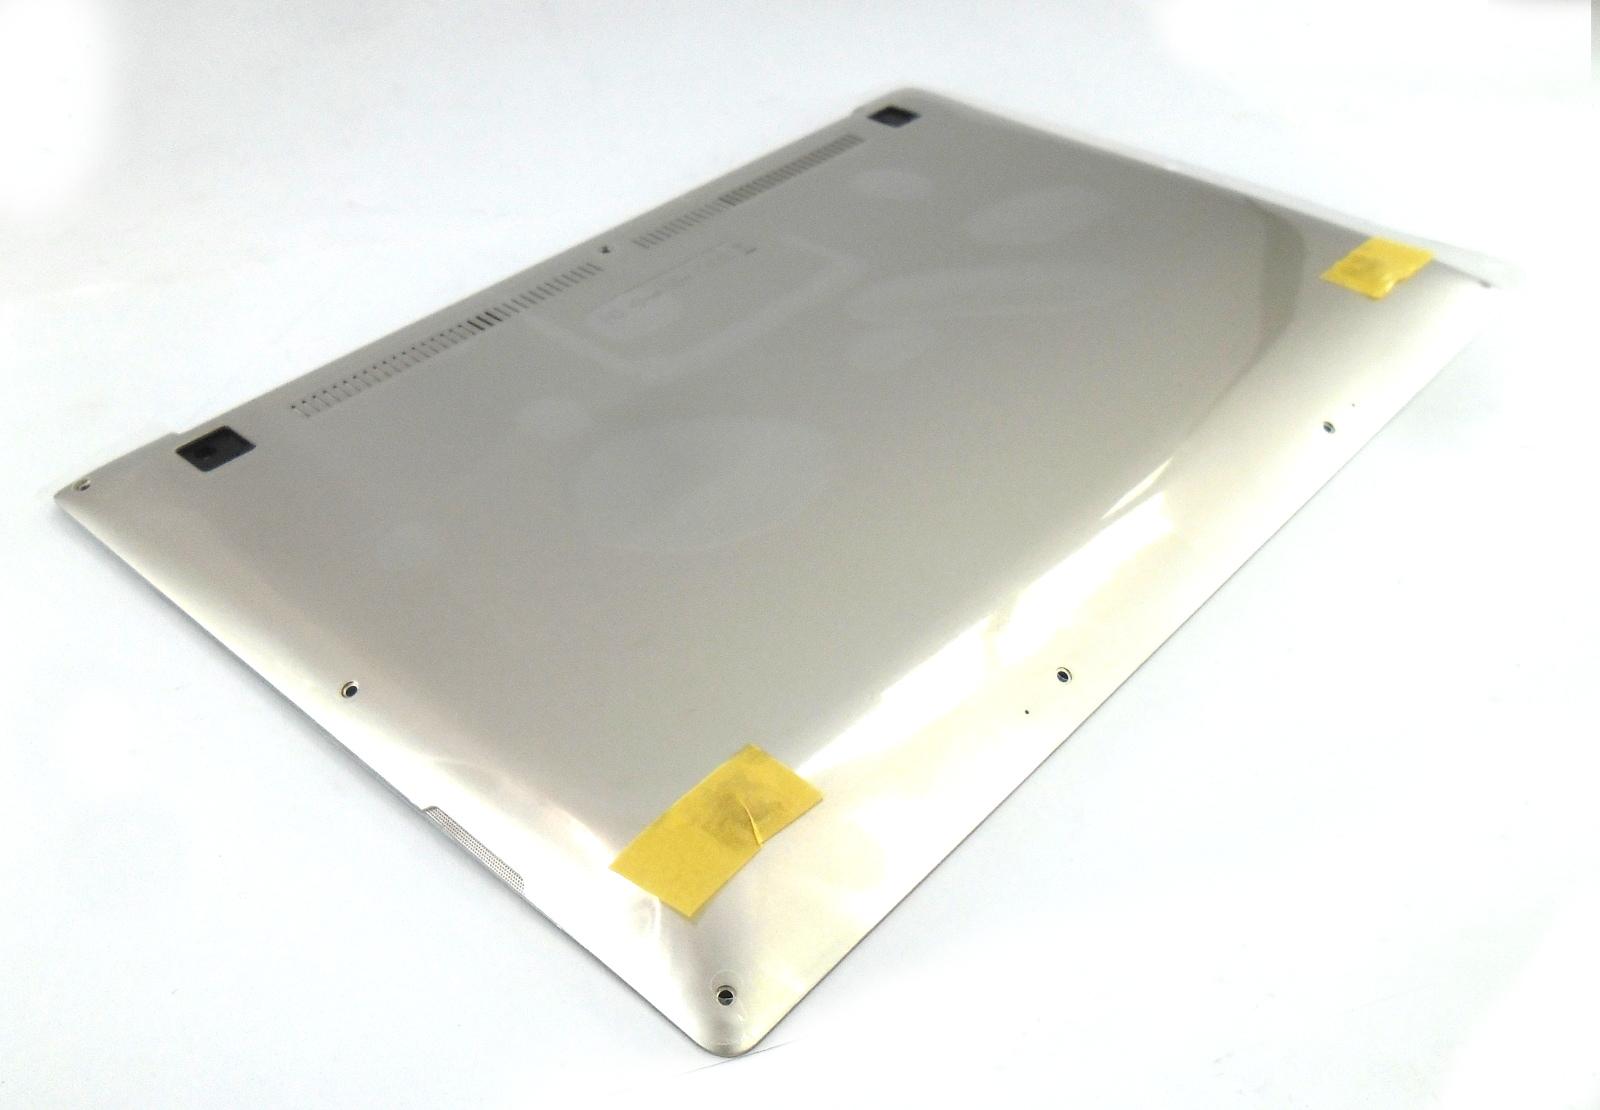 90NB04R5-R7D010 Asus ZenBook UX303LN-1C Bottom base cover assembly